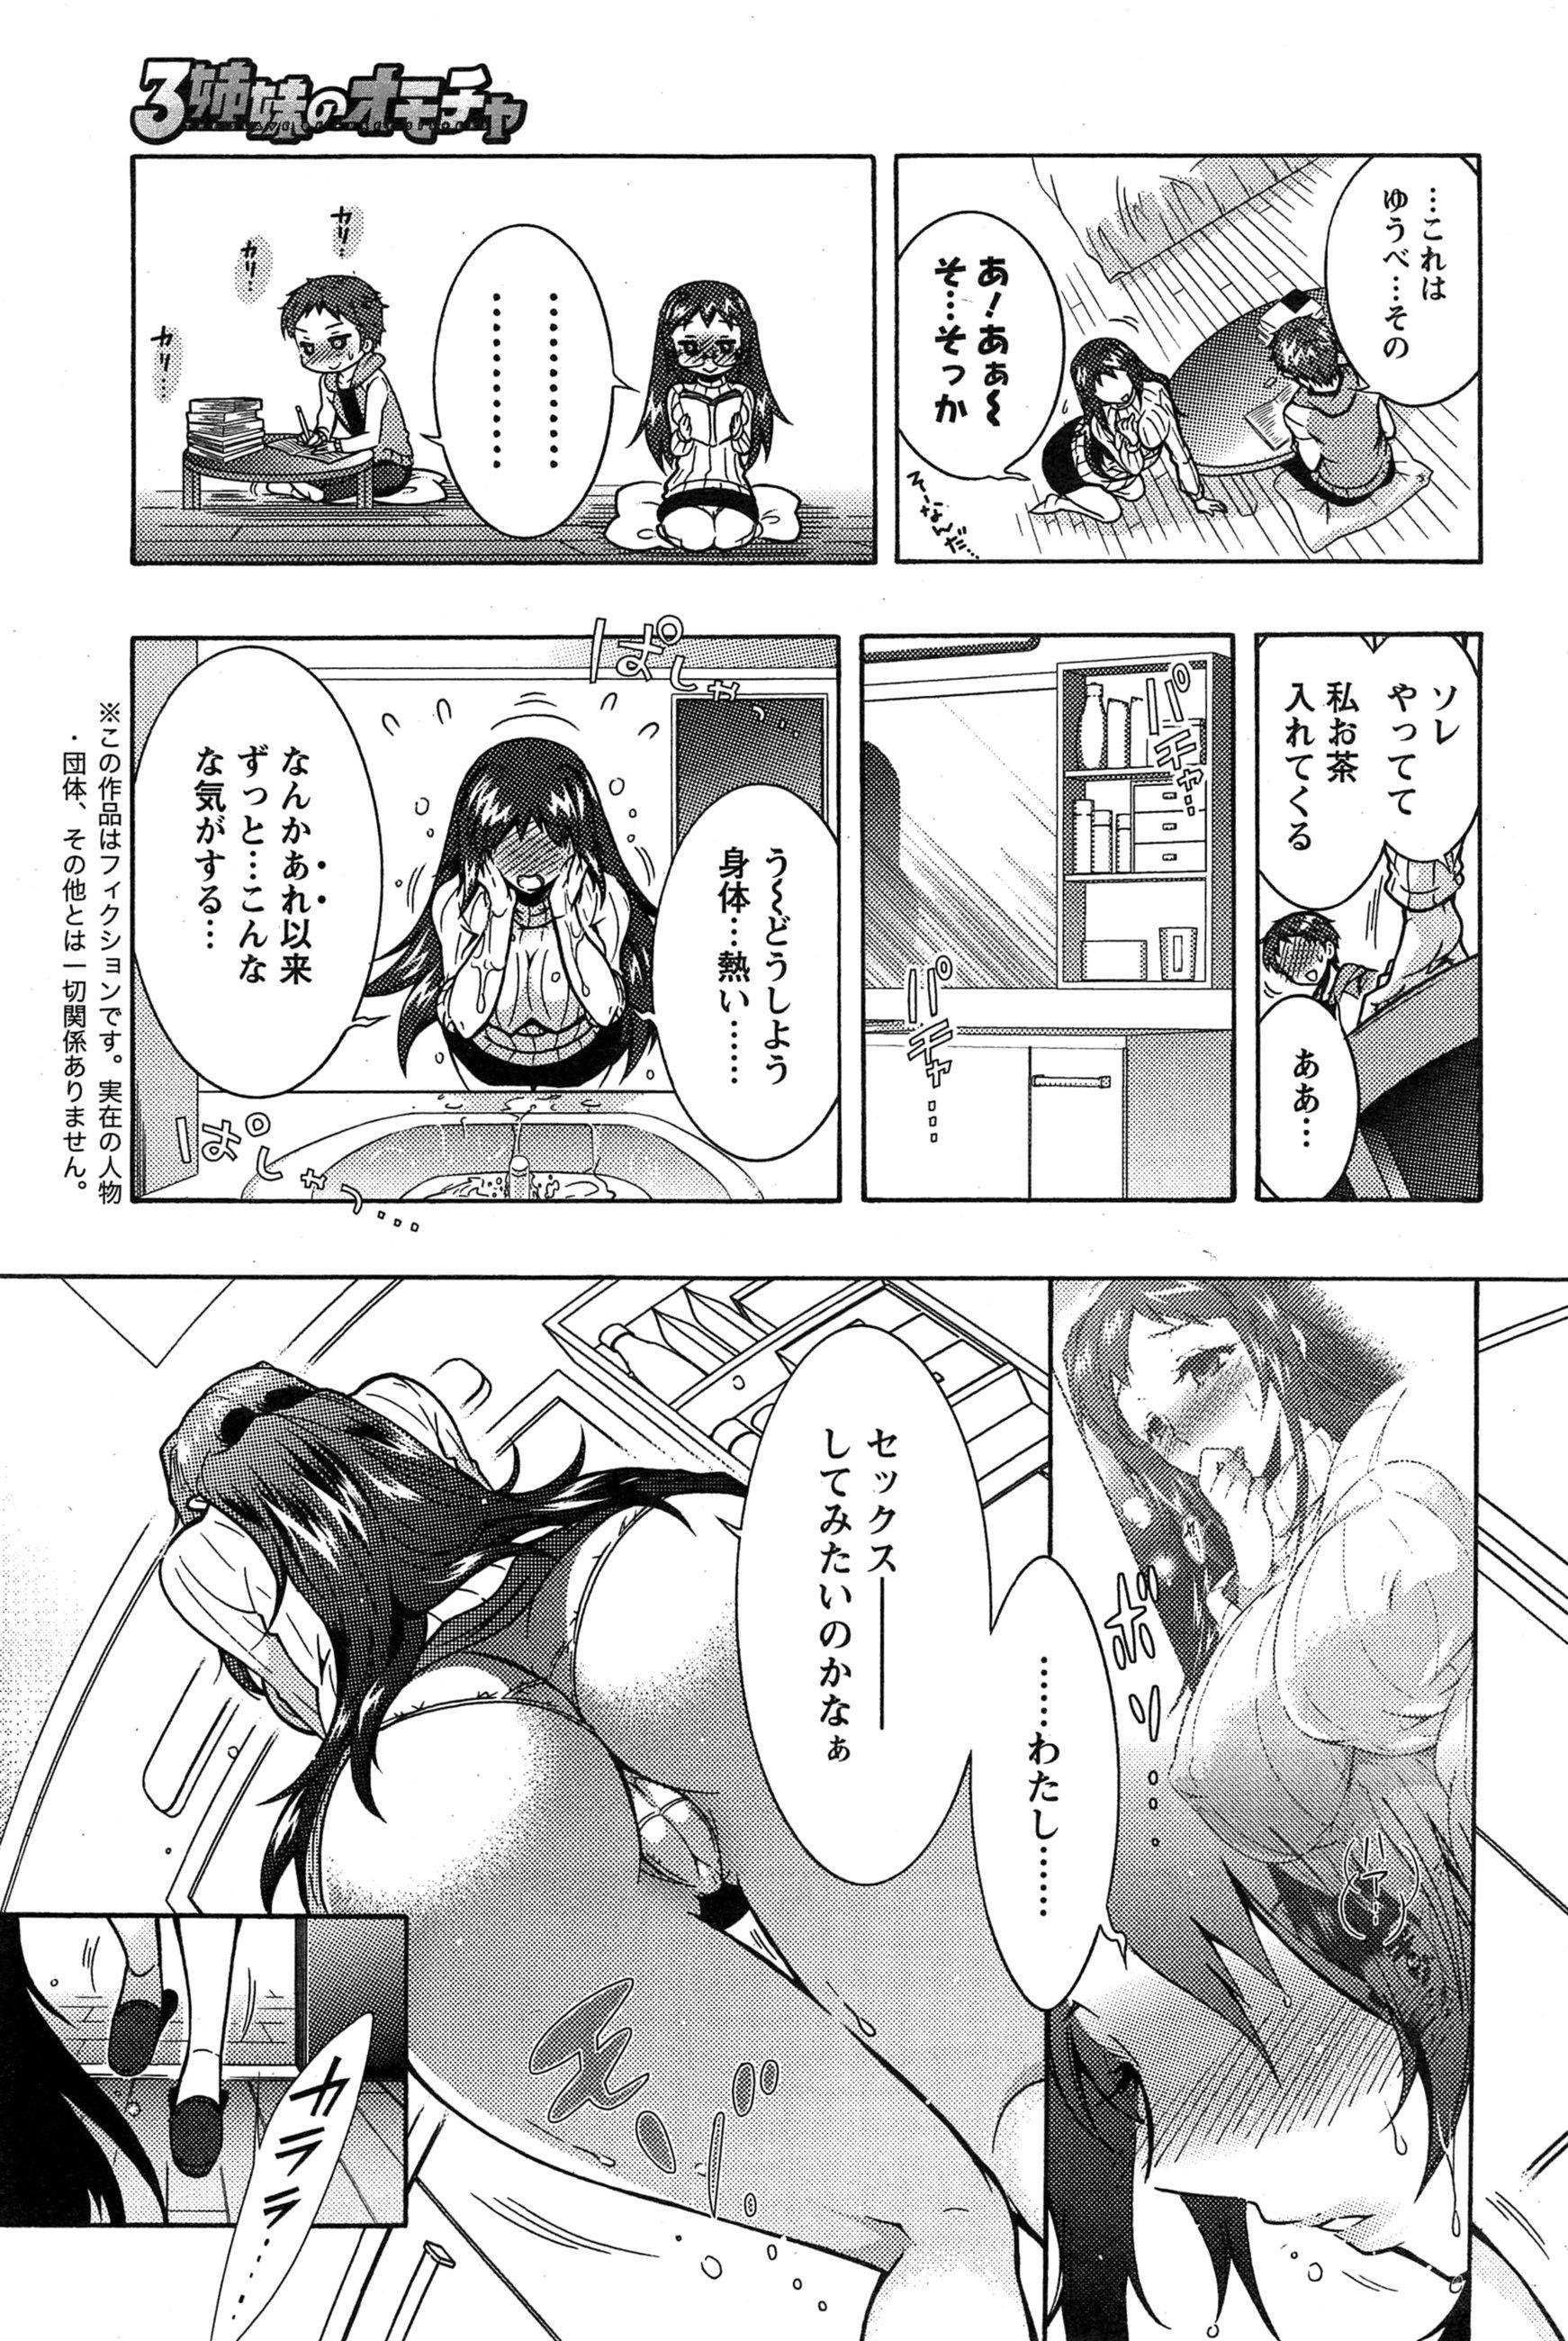 [Honda Arima] Sanshimai no Omocha - The Slave of Three Sisters Ch. 1-6 79